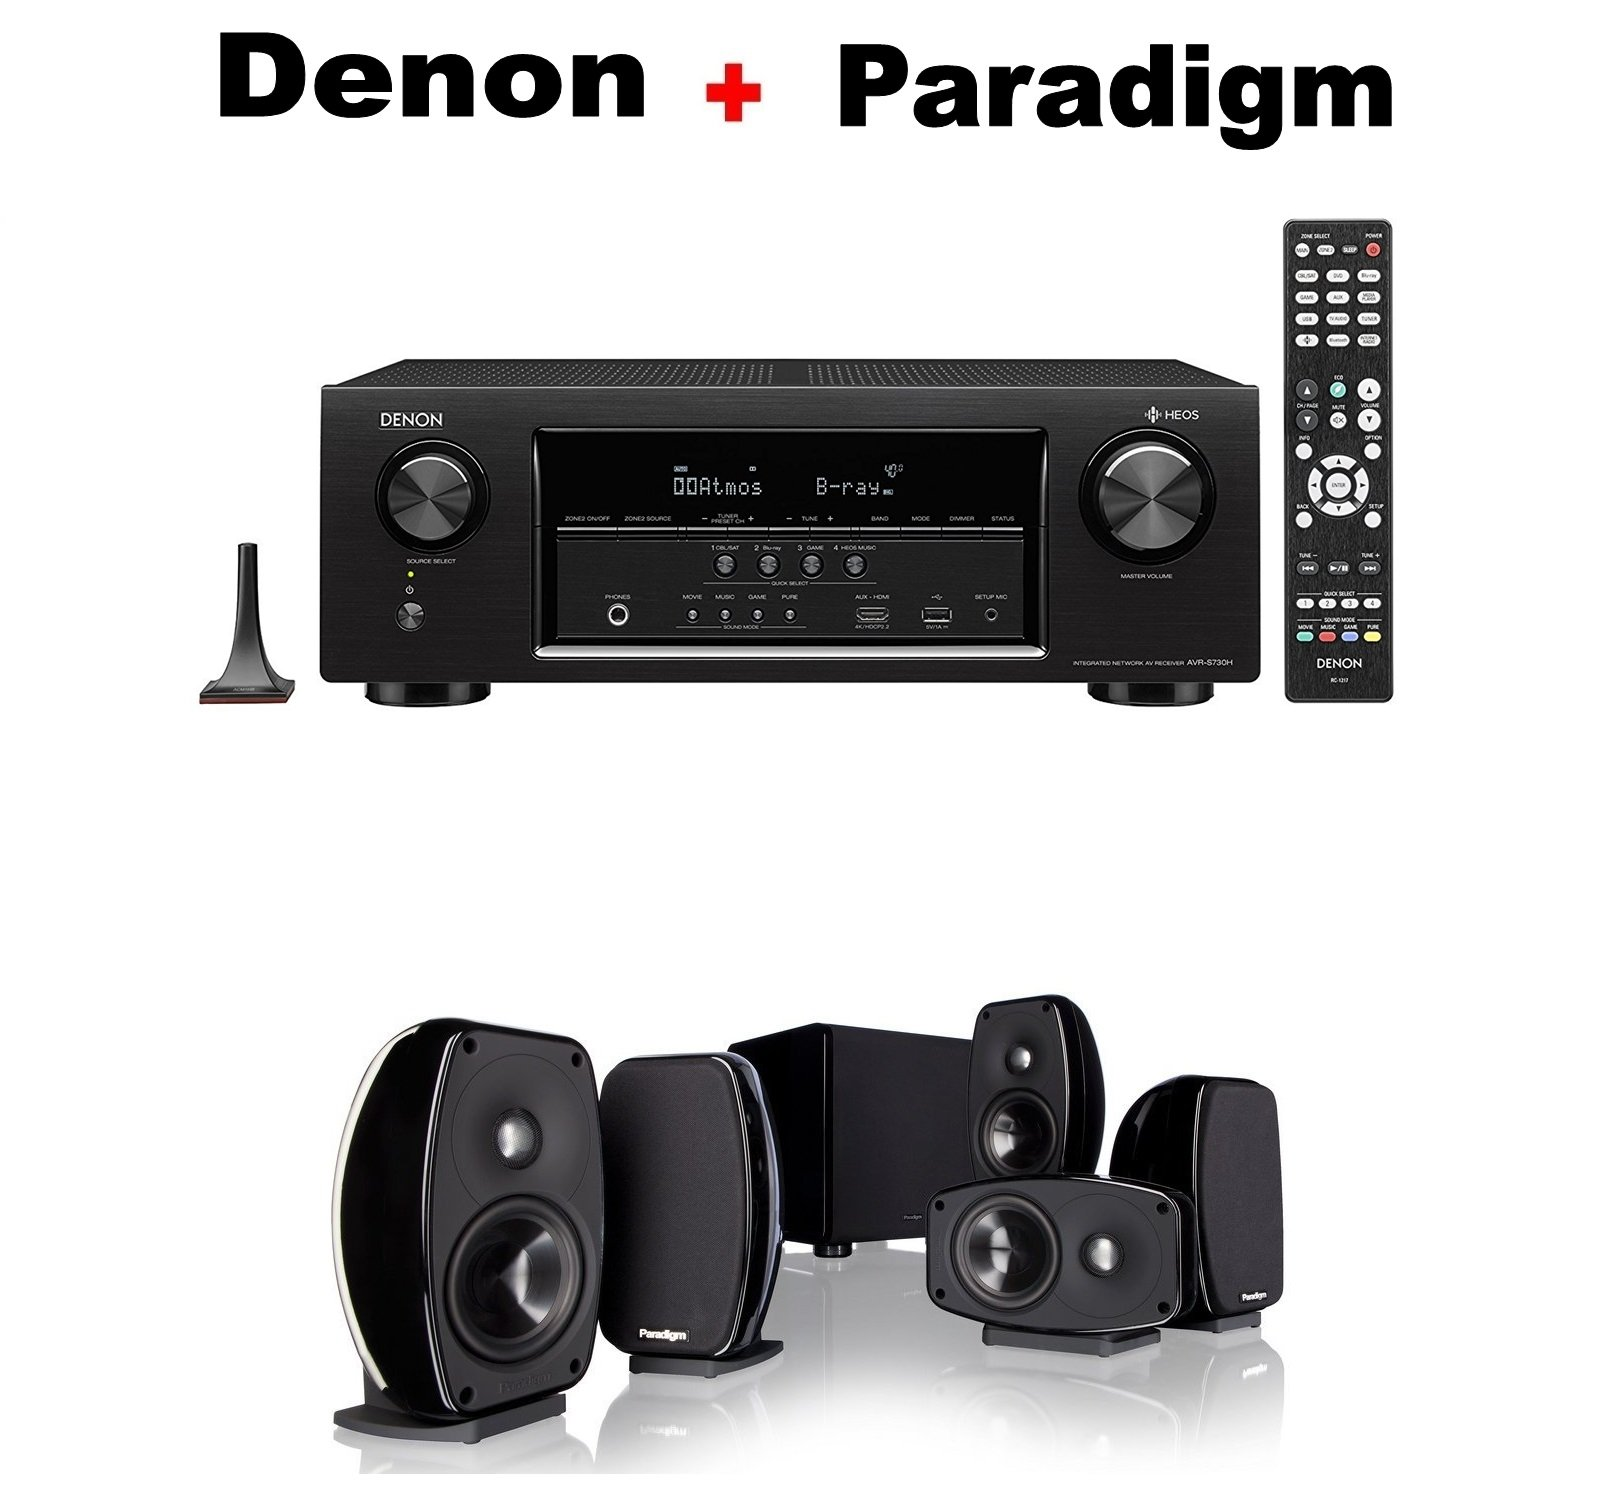 Denon Audio & Video Component Receiver Black (AVRS730H) + Paradigm Cinema 100 CT 5.1 Home Theater System Bundle by Denon